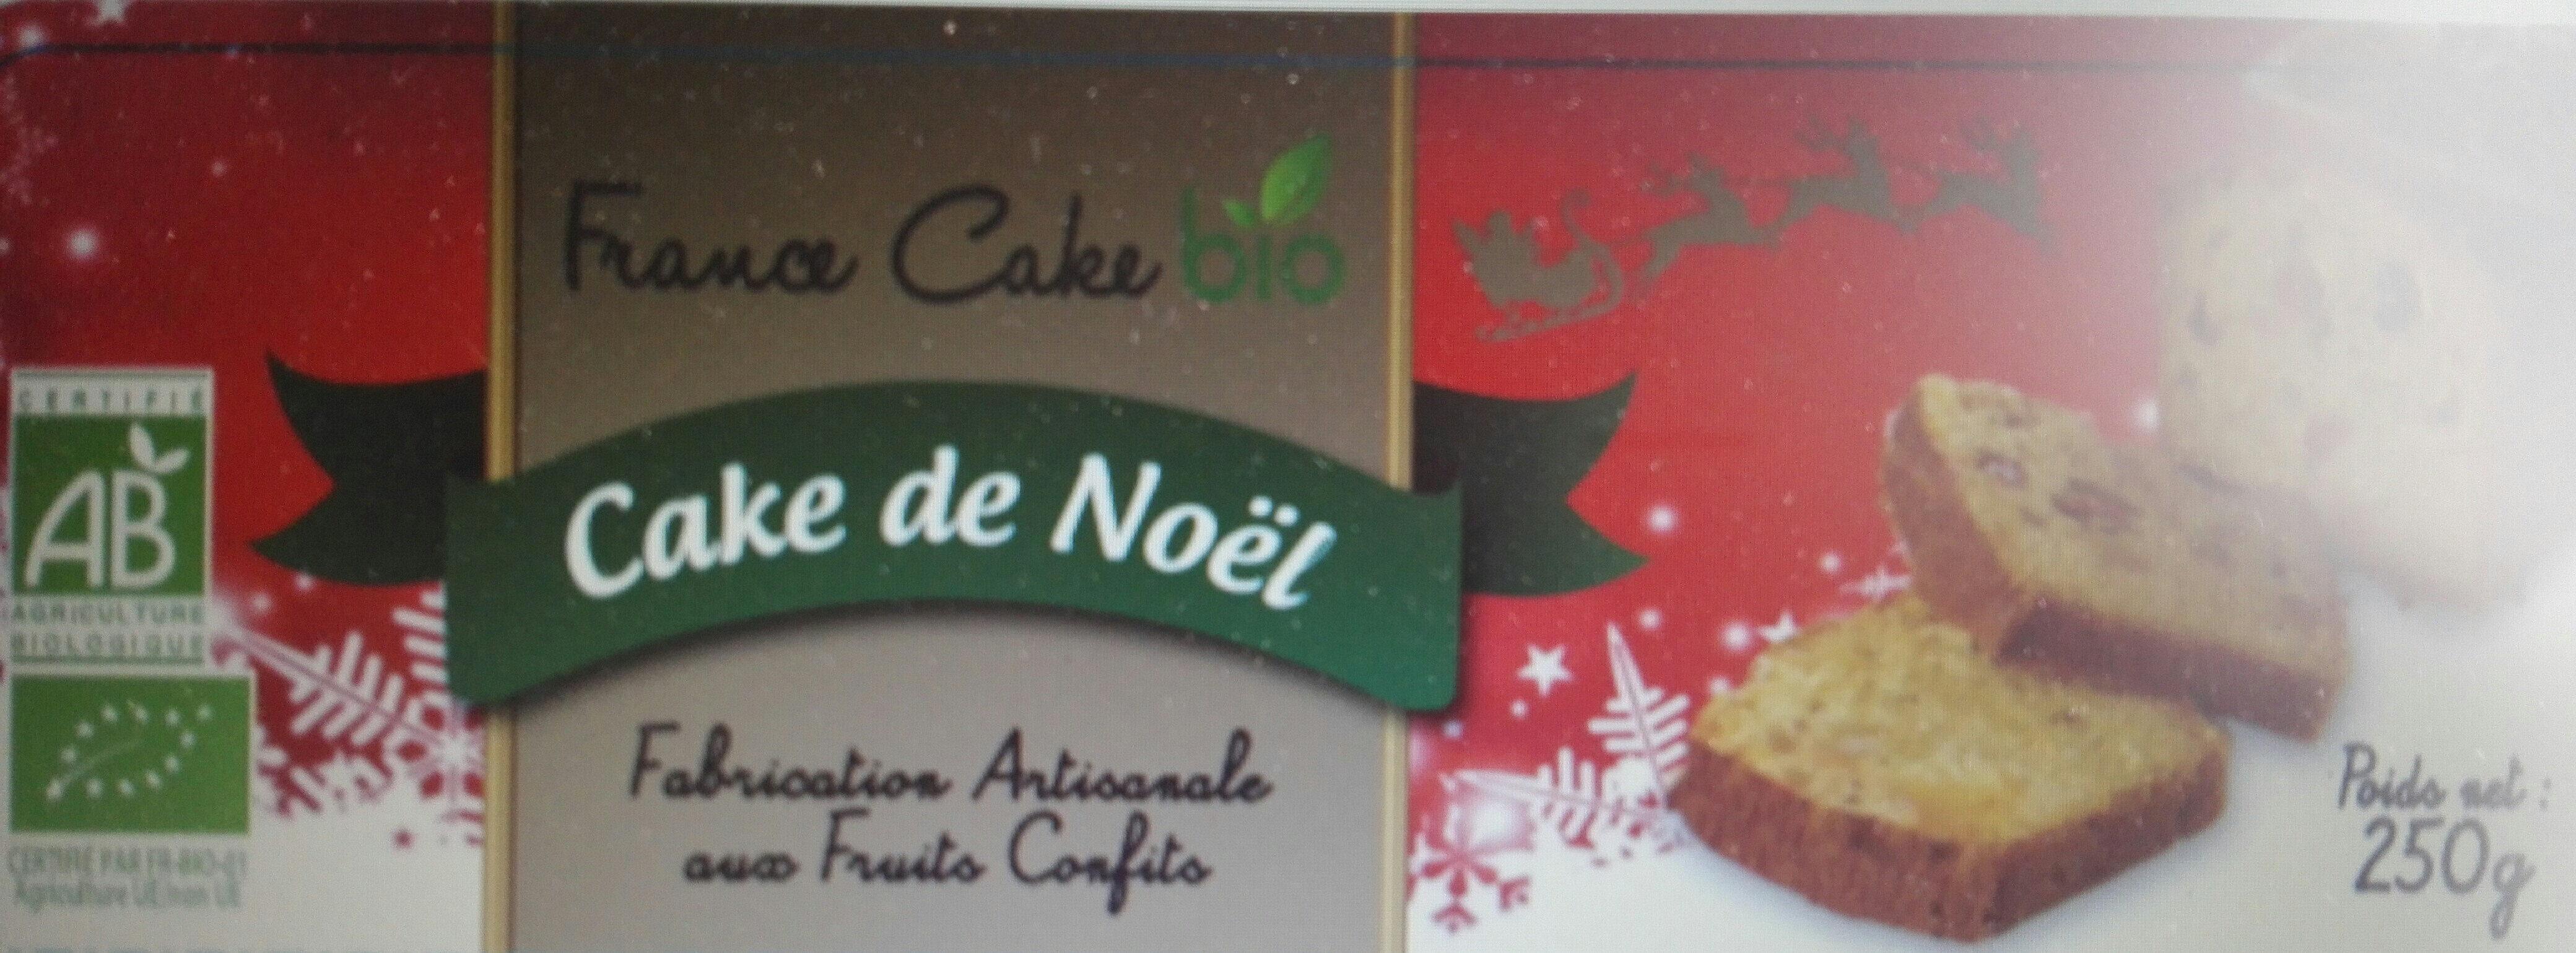 Cake de Noel - Product - fr